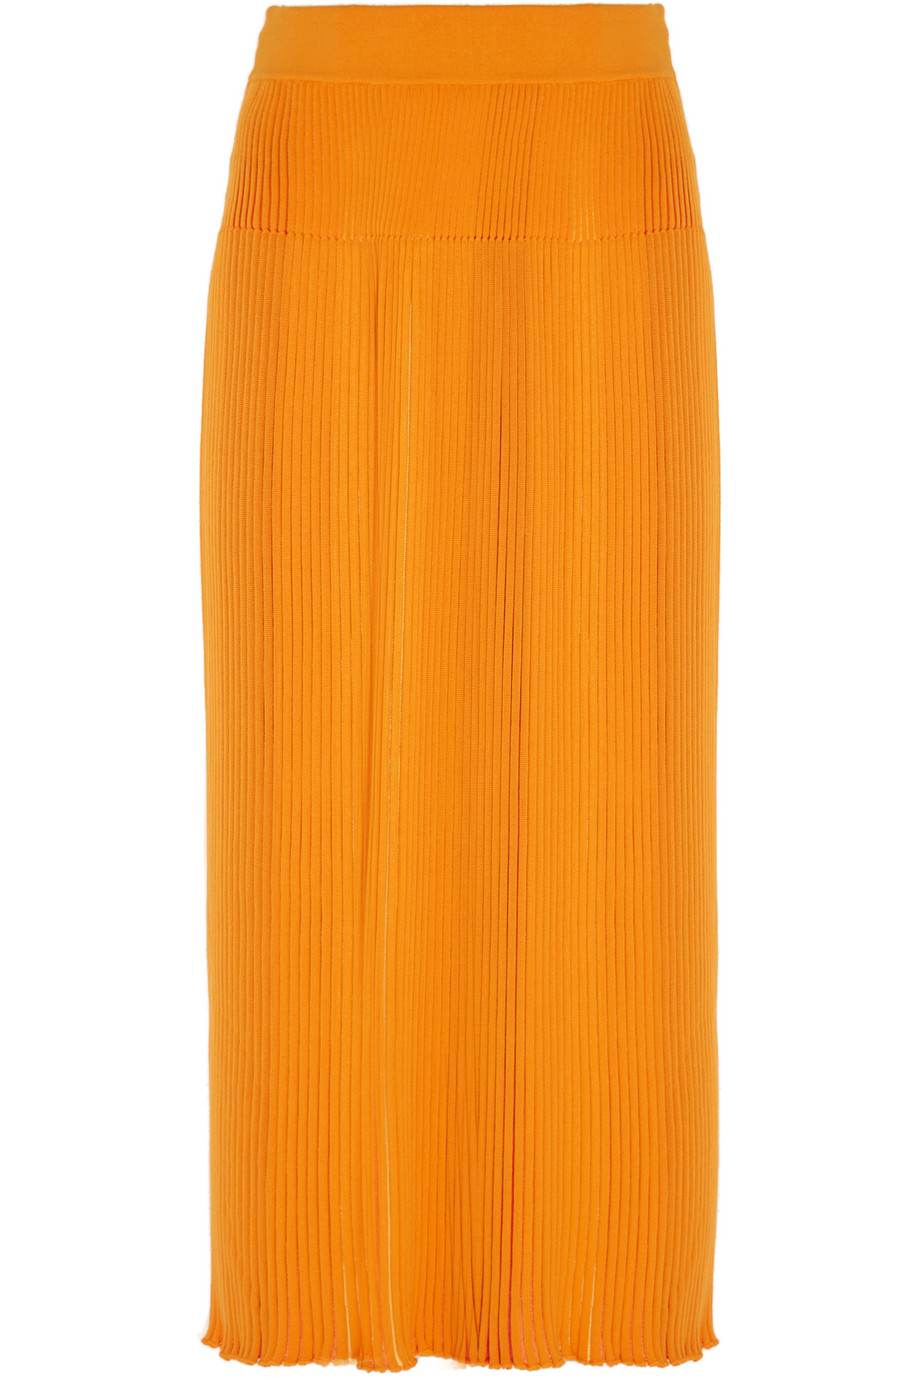 Sonia Rykiel Ribbed-Knit Skirt, Saffron/Orange, Women's